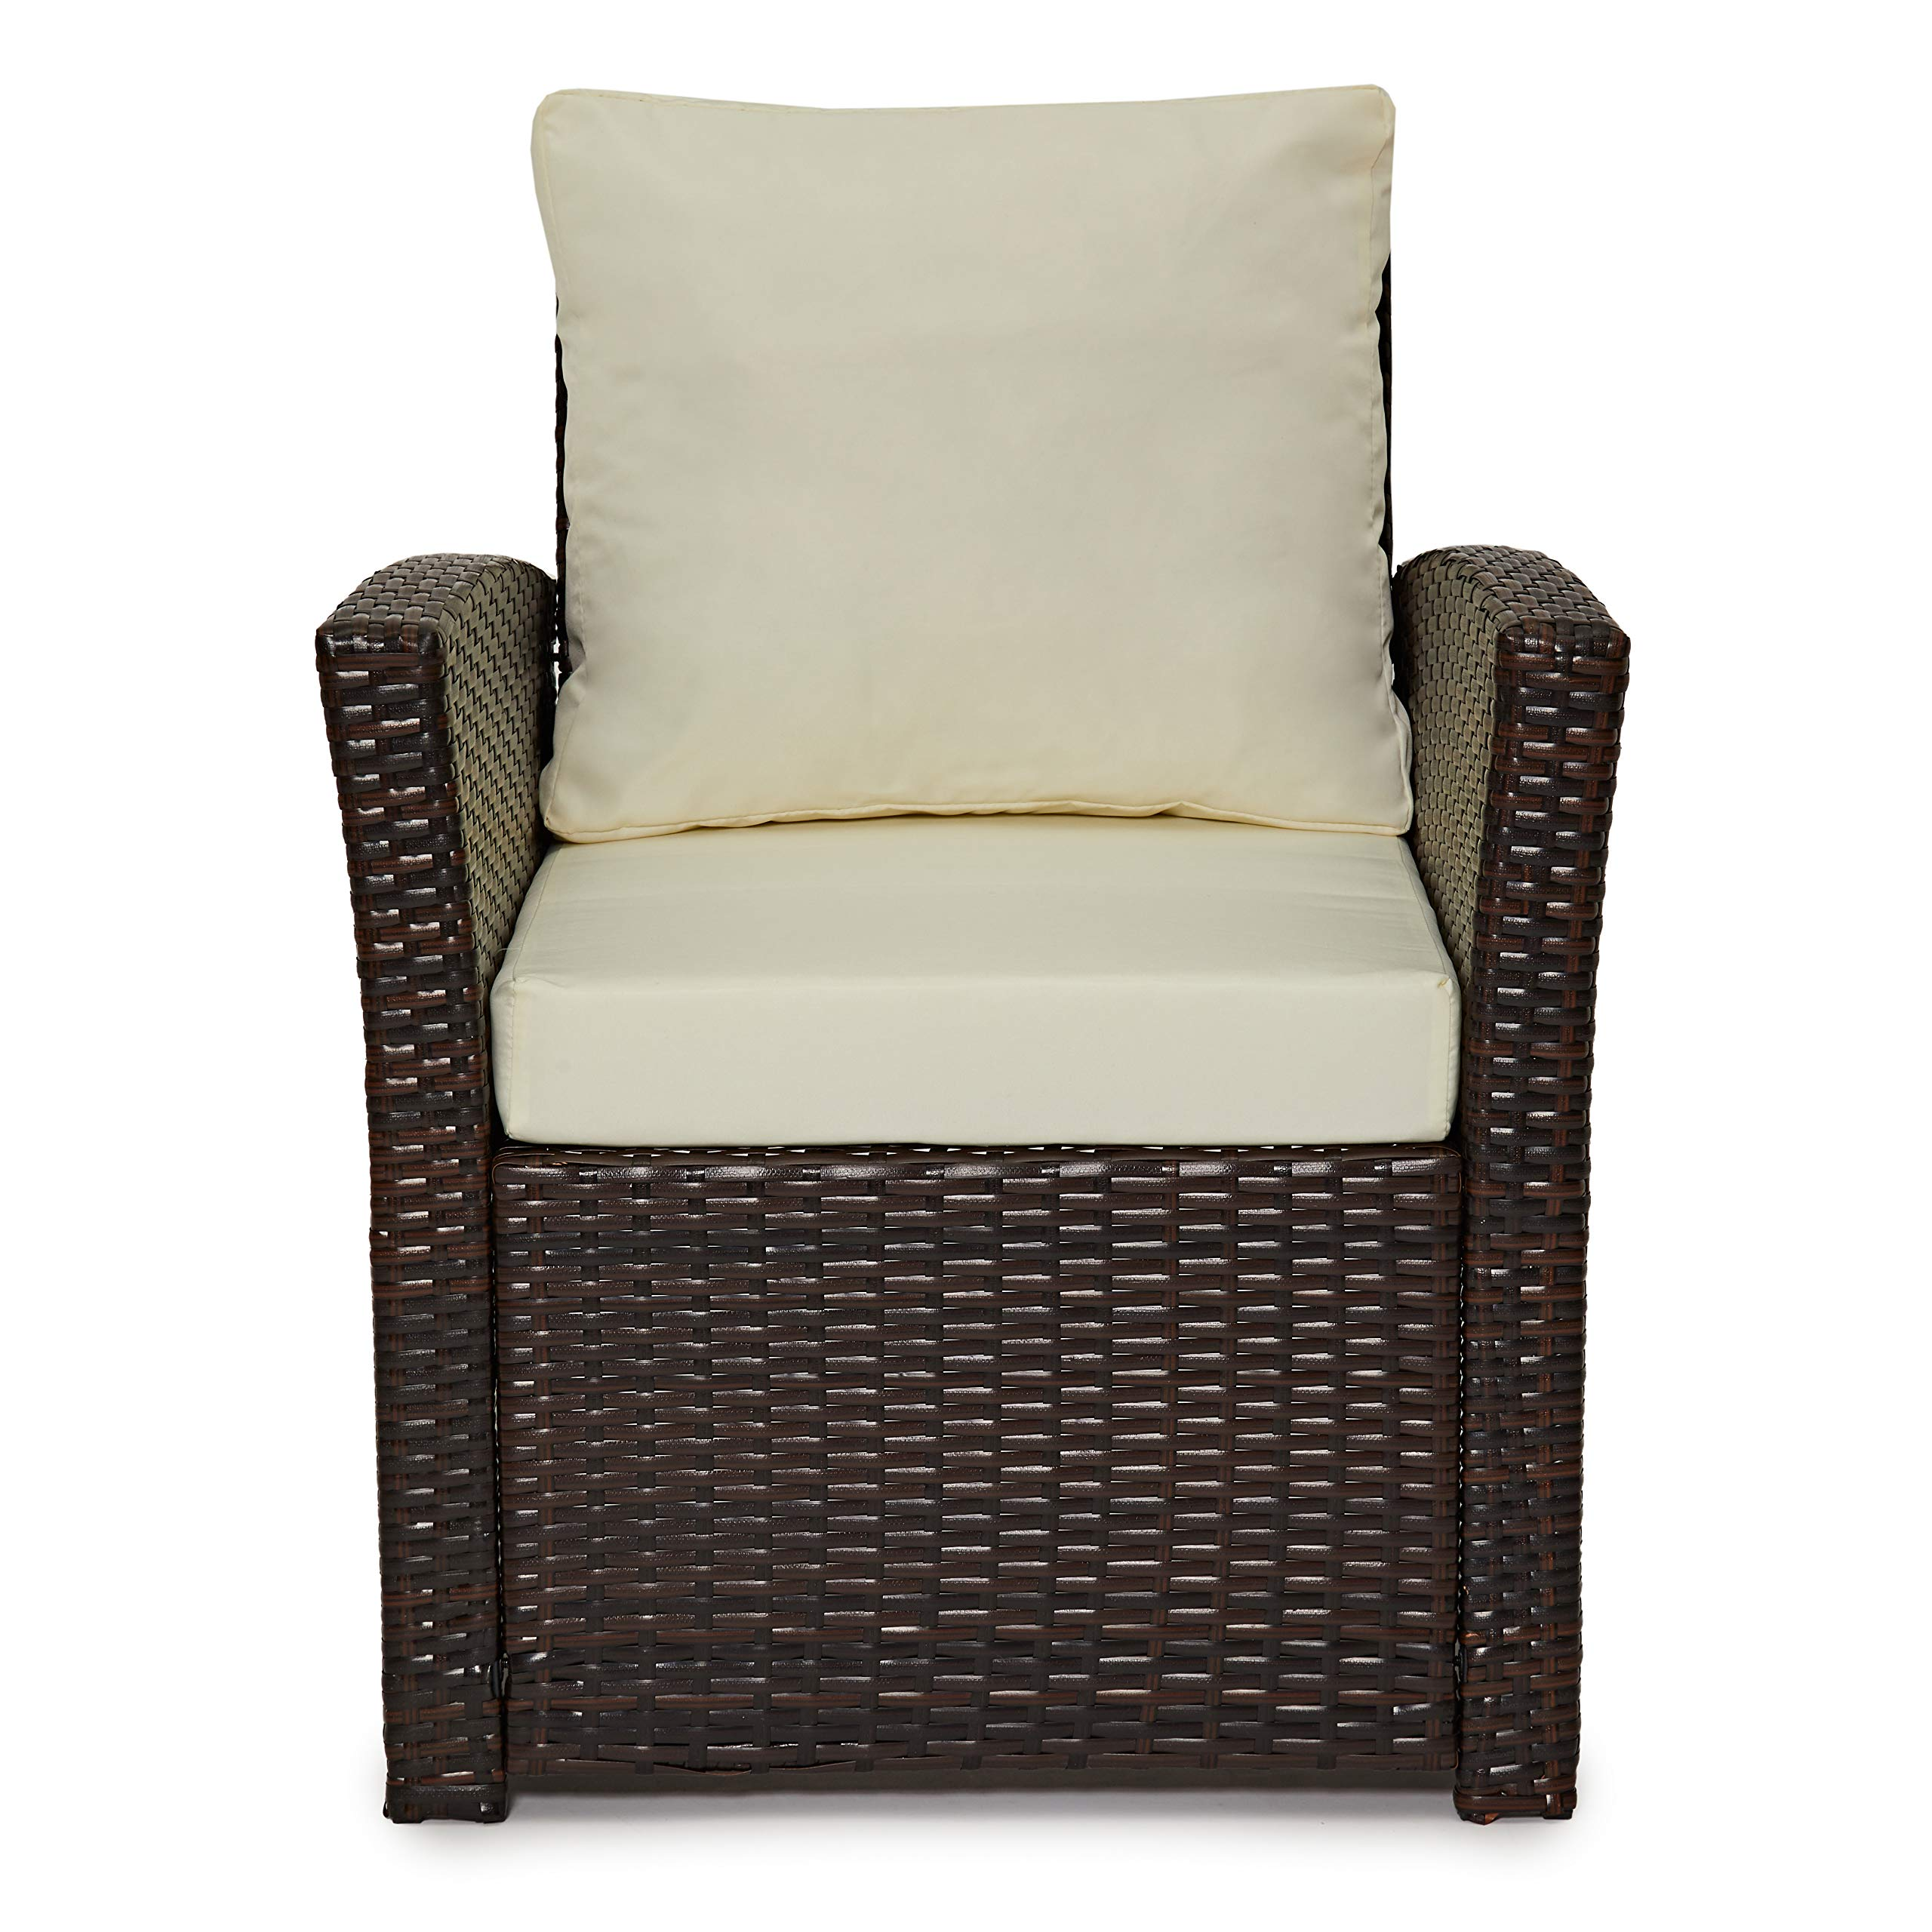 Juego de muebles de ratán Roma de Evre para jardín, exterior o ...